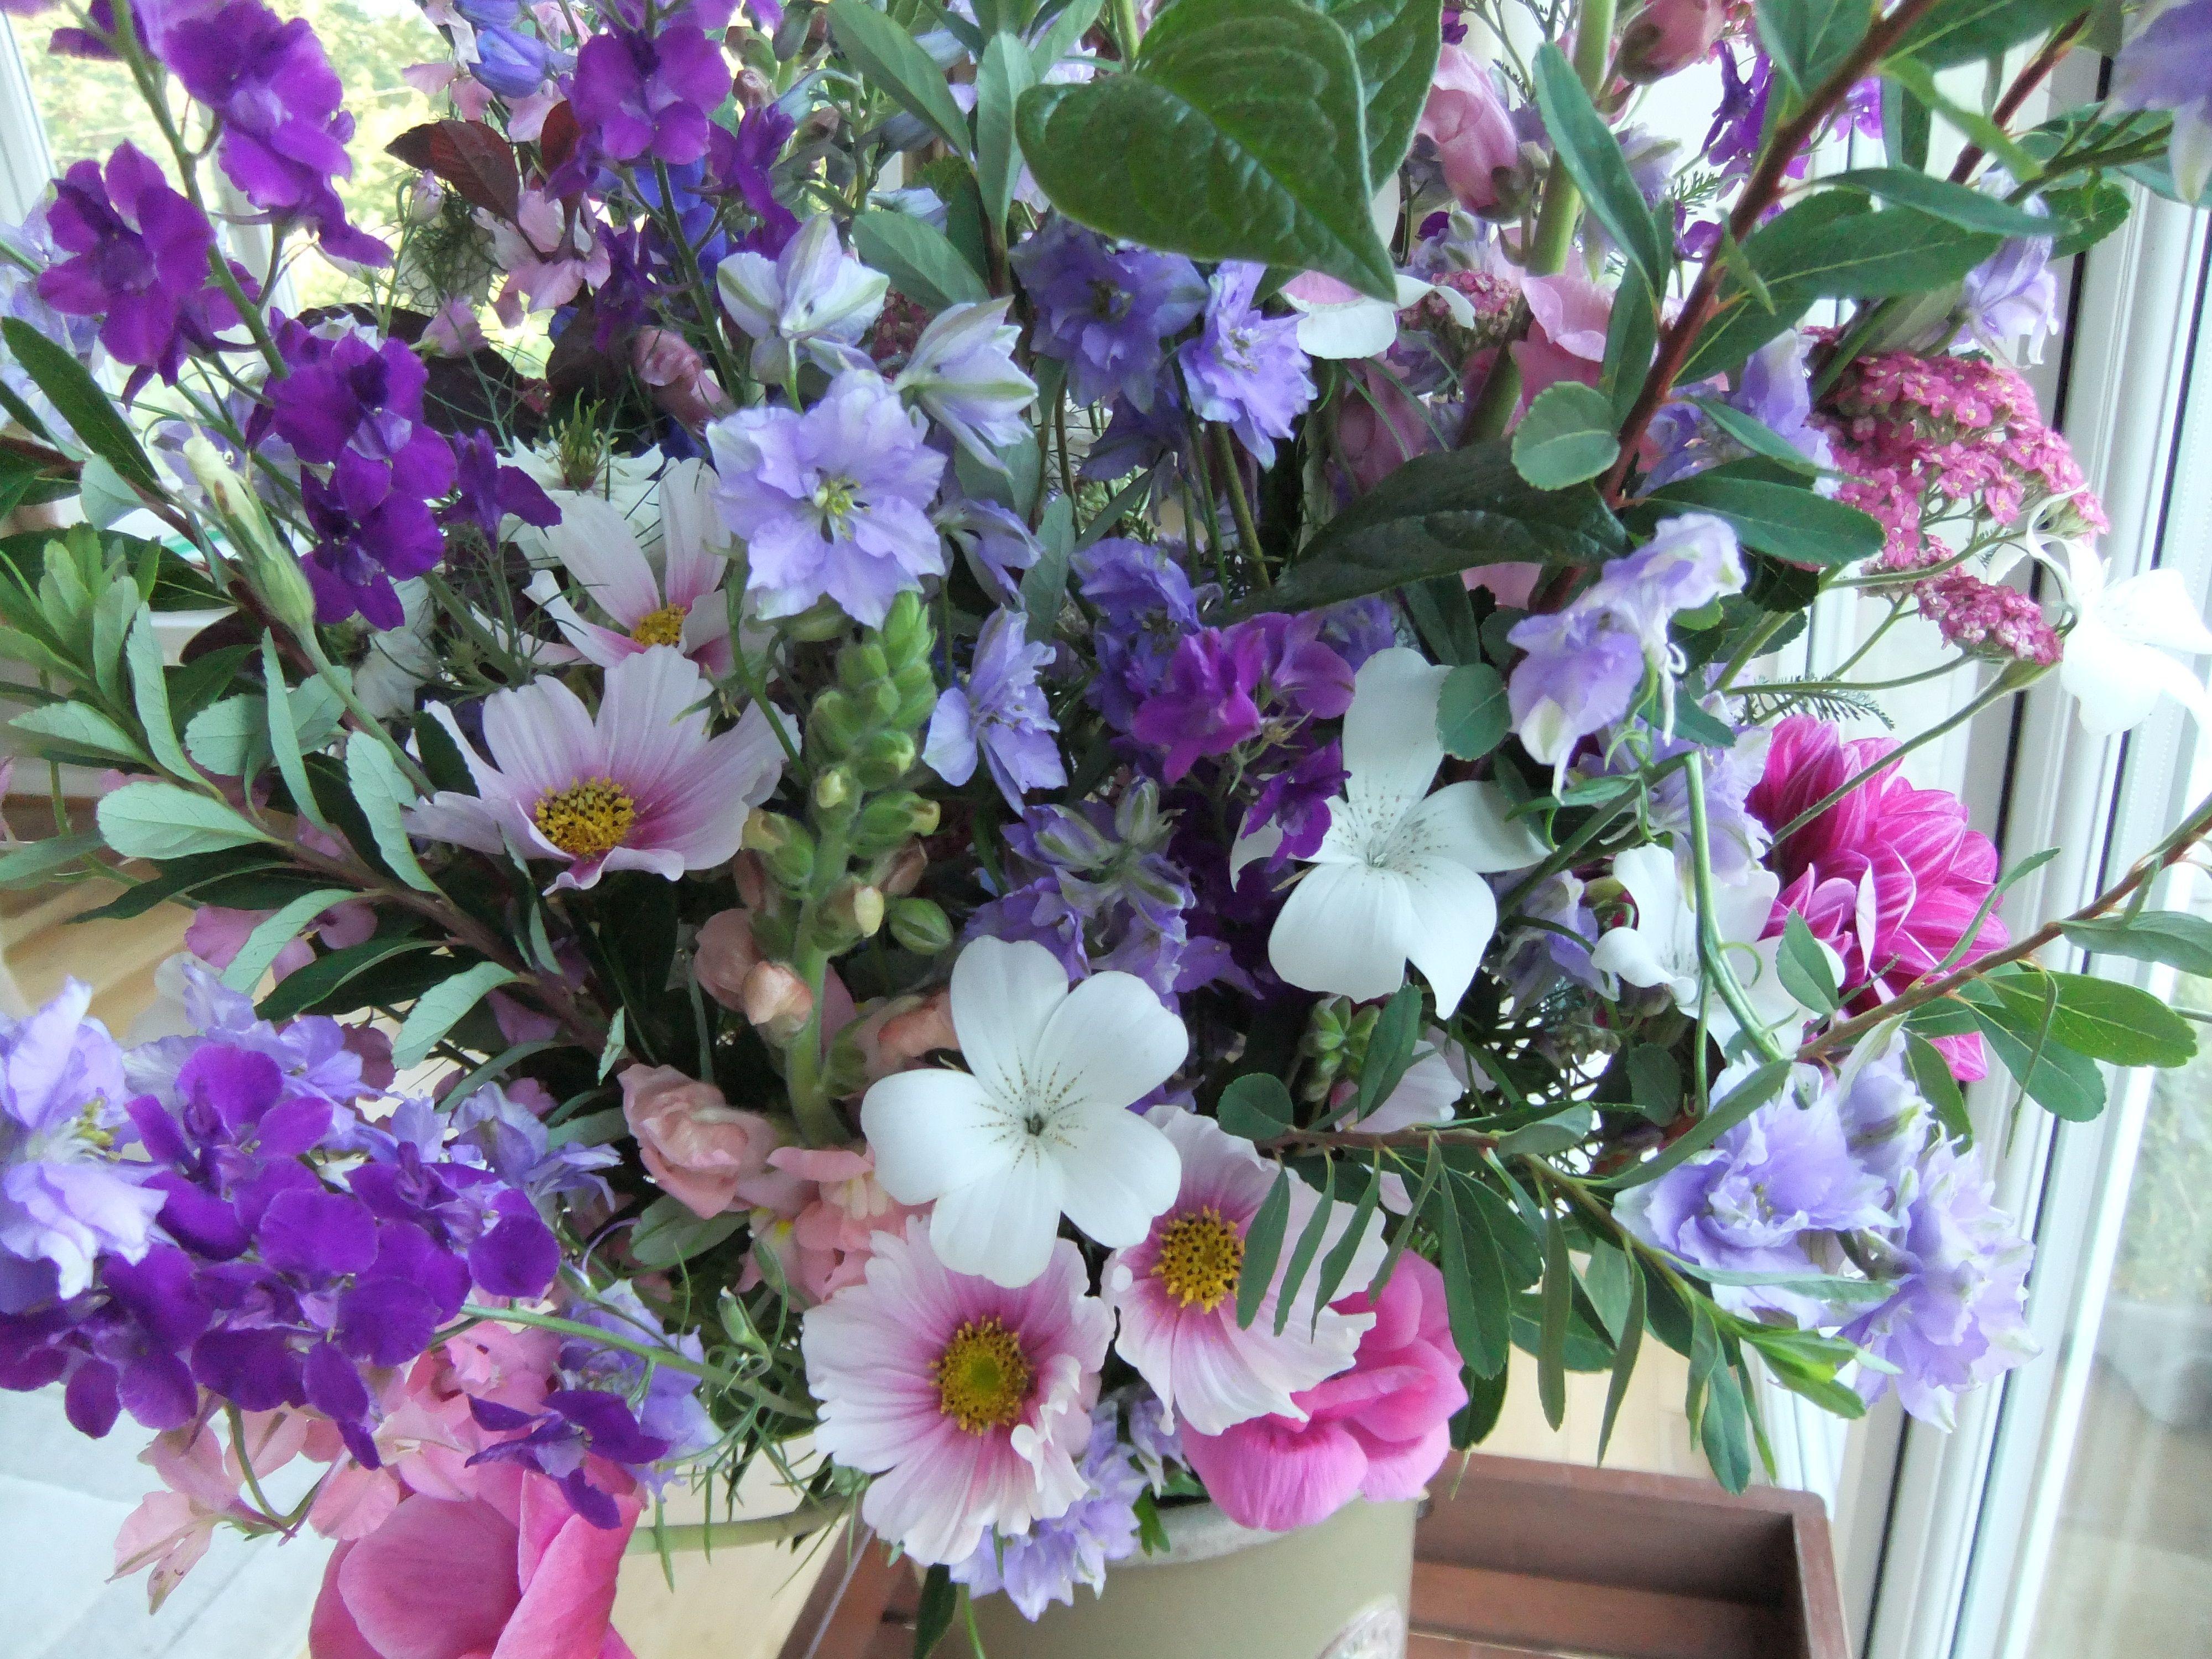 July Cottage Garden Bouquet Of Cosmos Larkspur Corncockle Antirrhinum And Anenome Country Garden Flowers Wedding Flowers Summer Bouquet